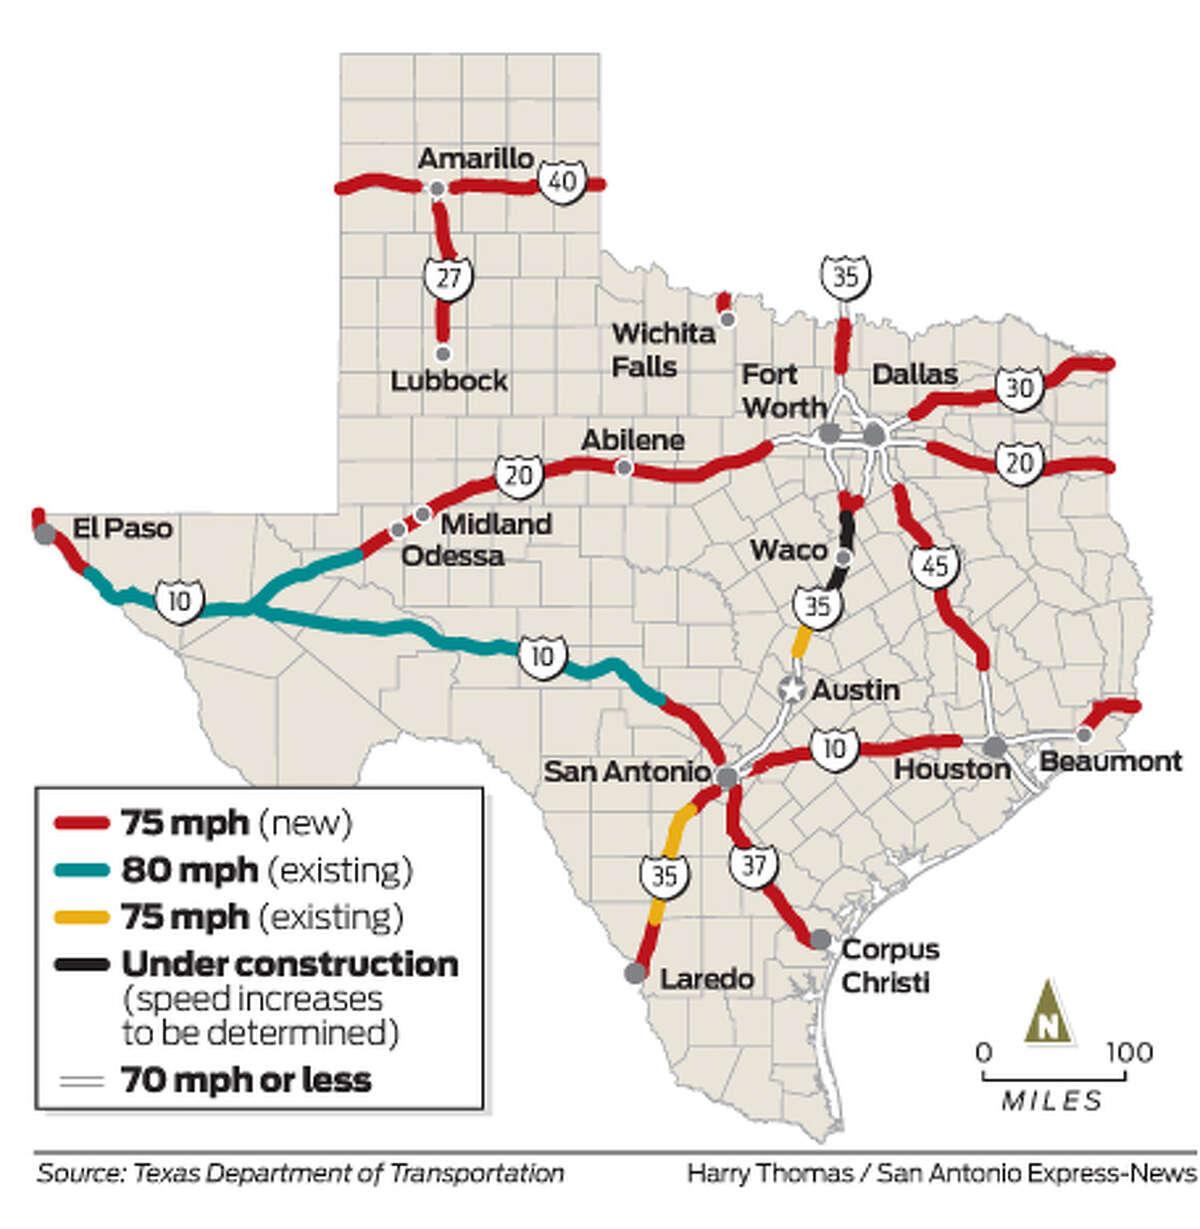 Interstate highway speed increases